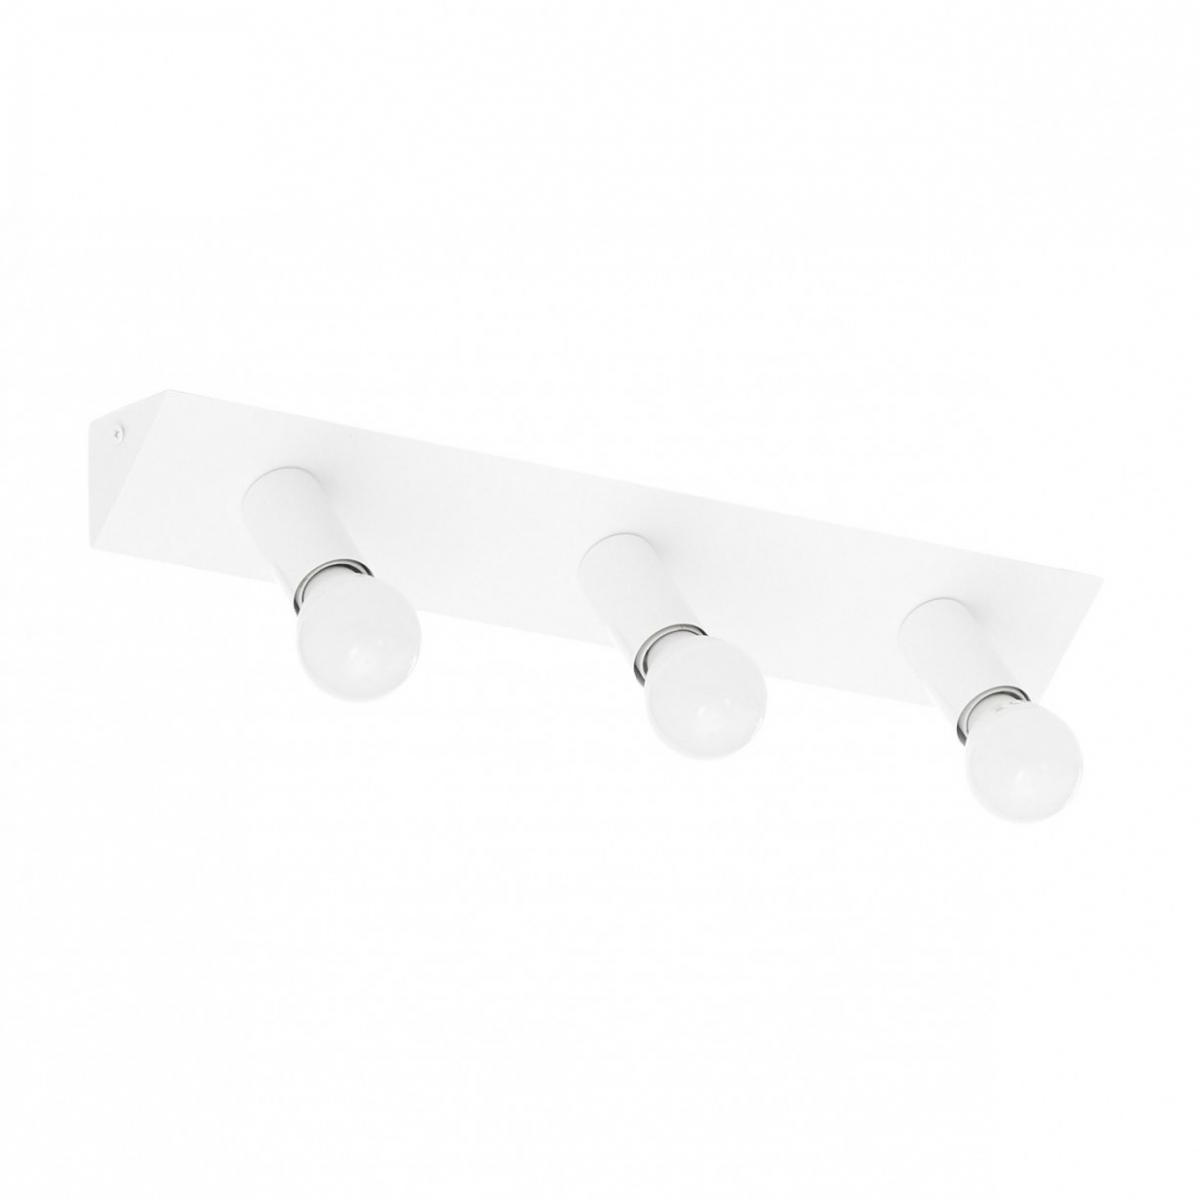 Neuf Minimaliste Ampoules Avec Lumineuse Rampe Maximum KJ1TlFc